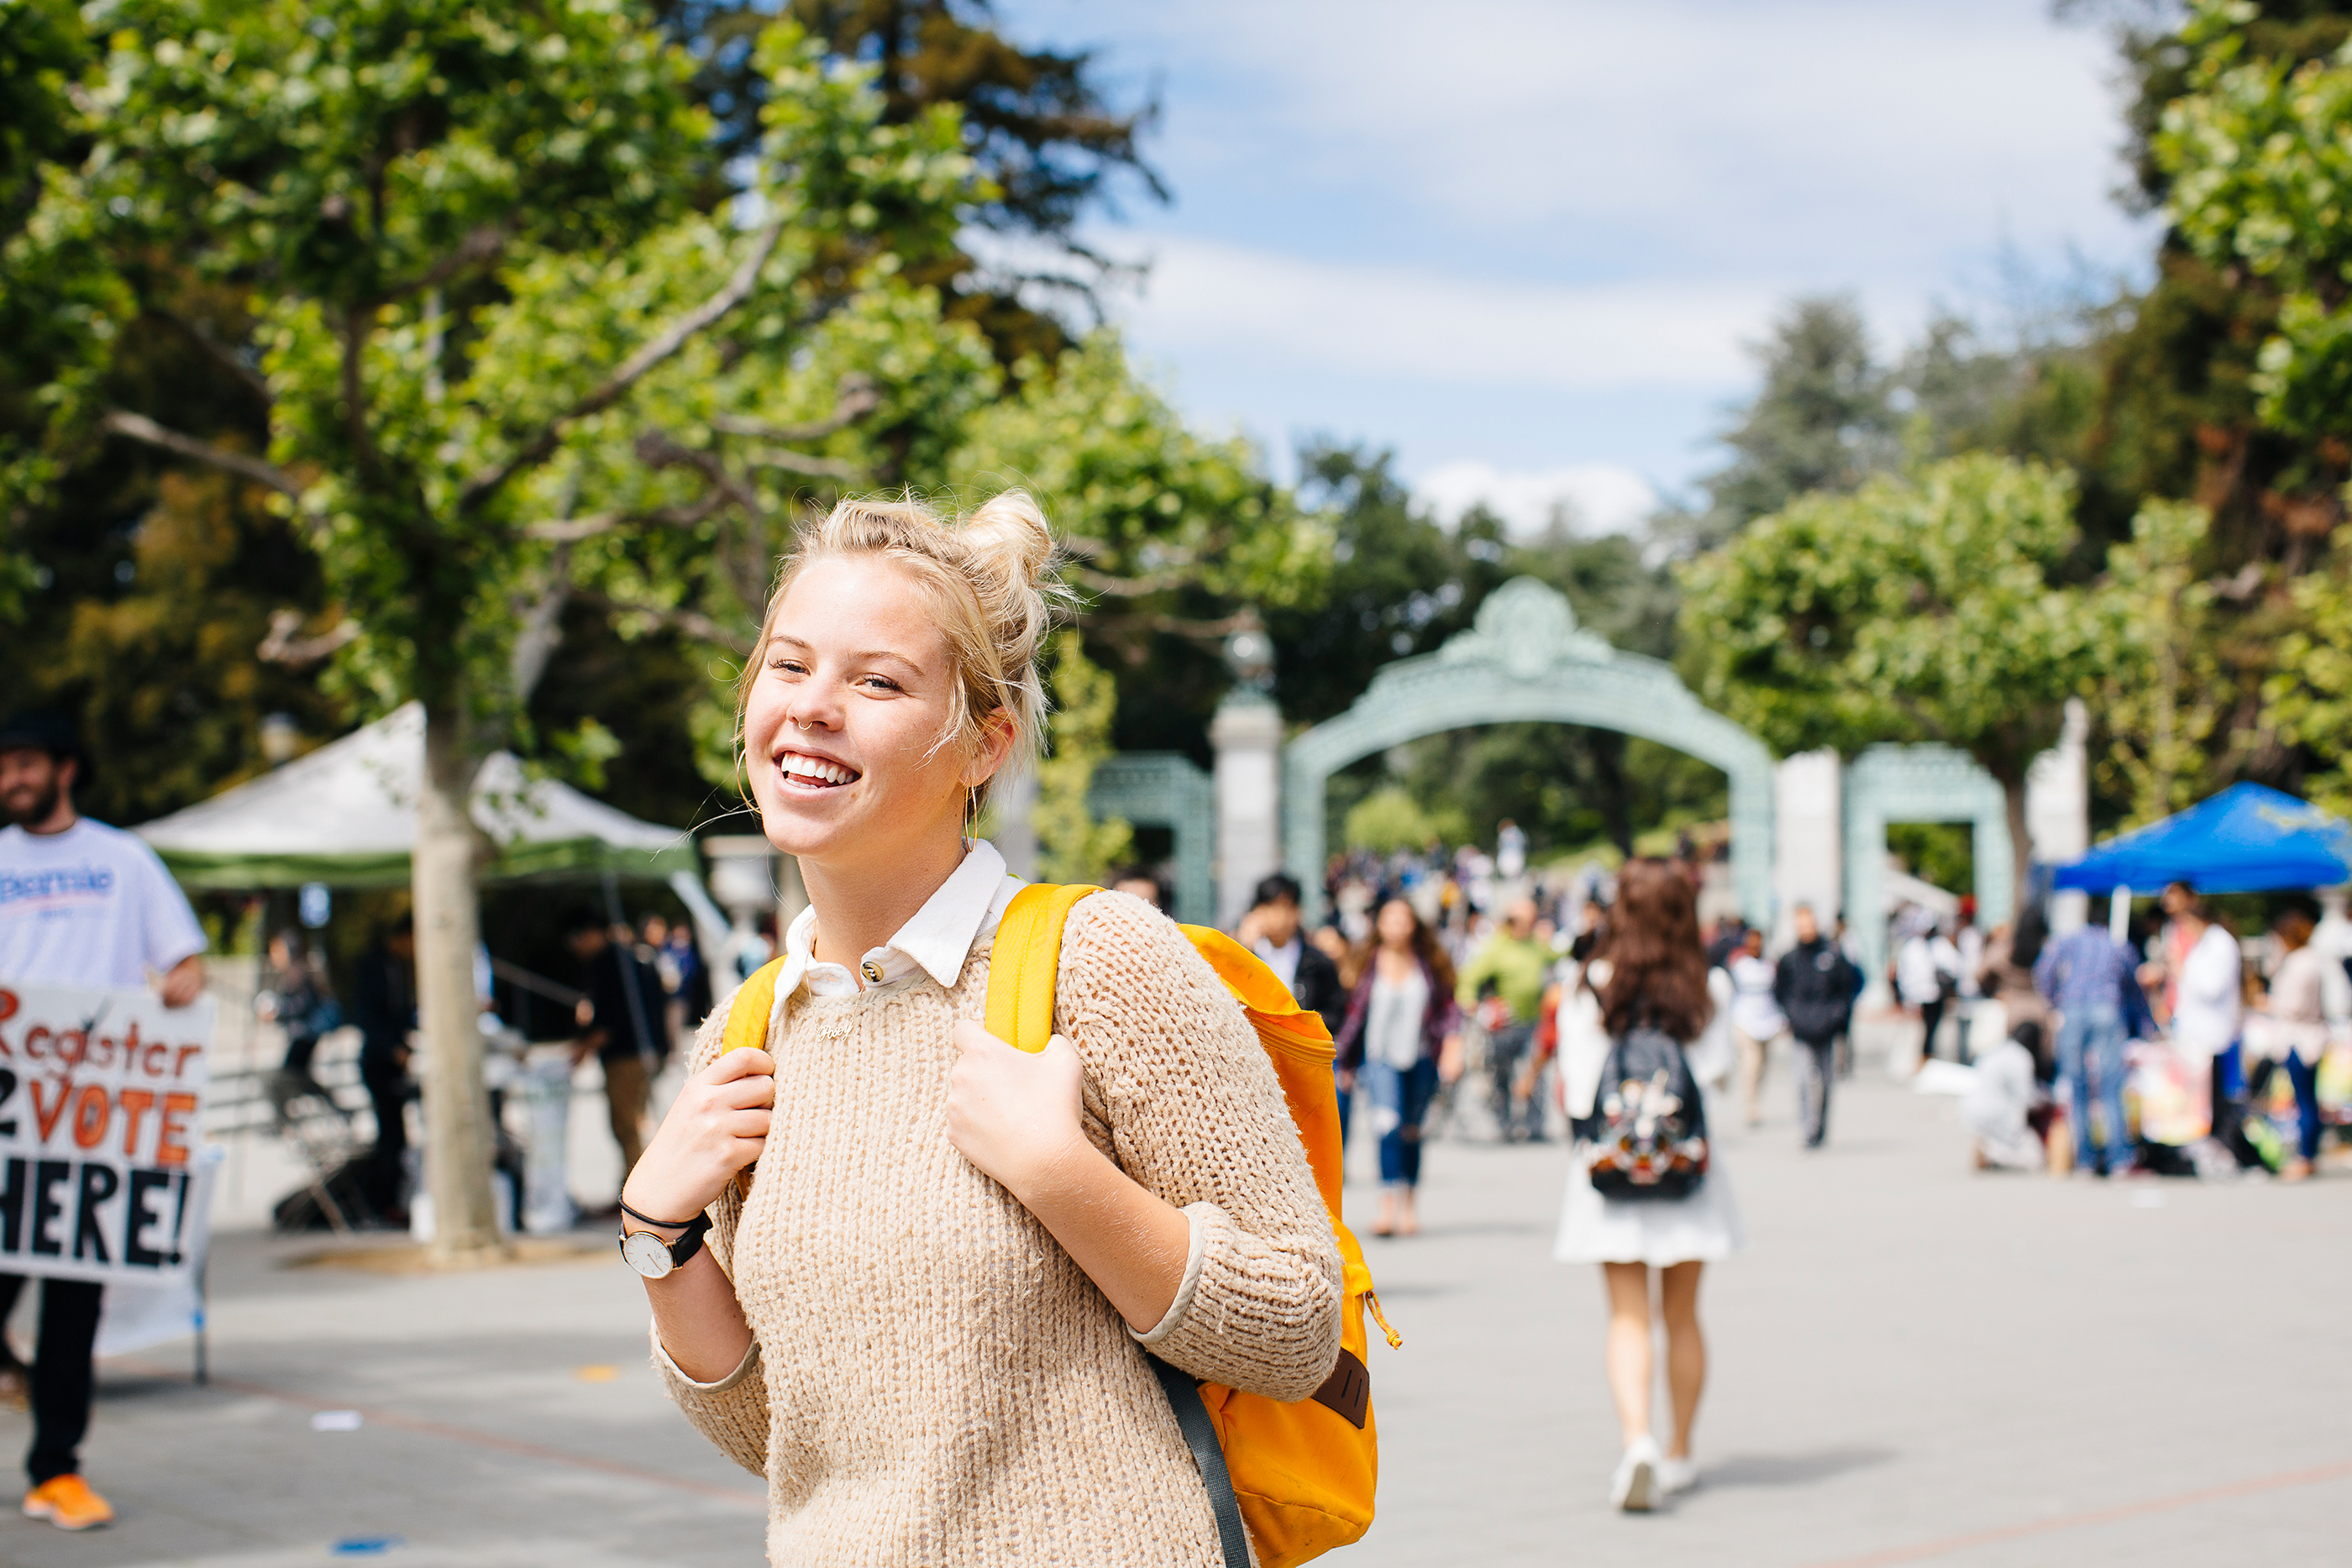 Students, Sproul Plaza, University of California–Berkeley